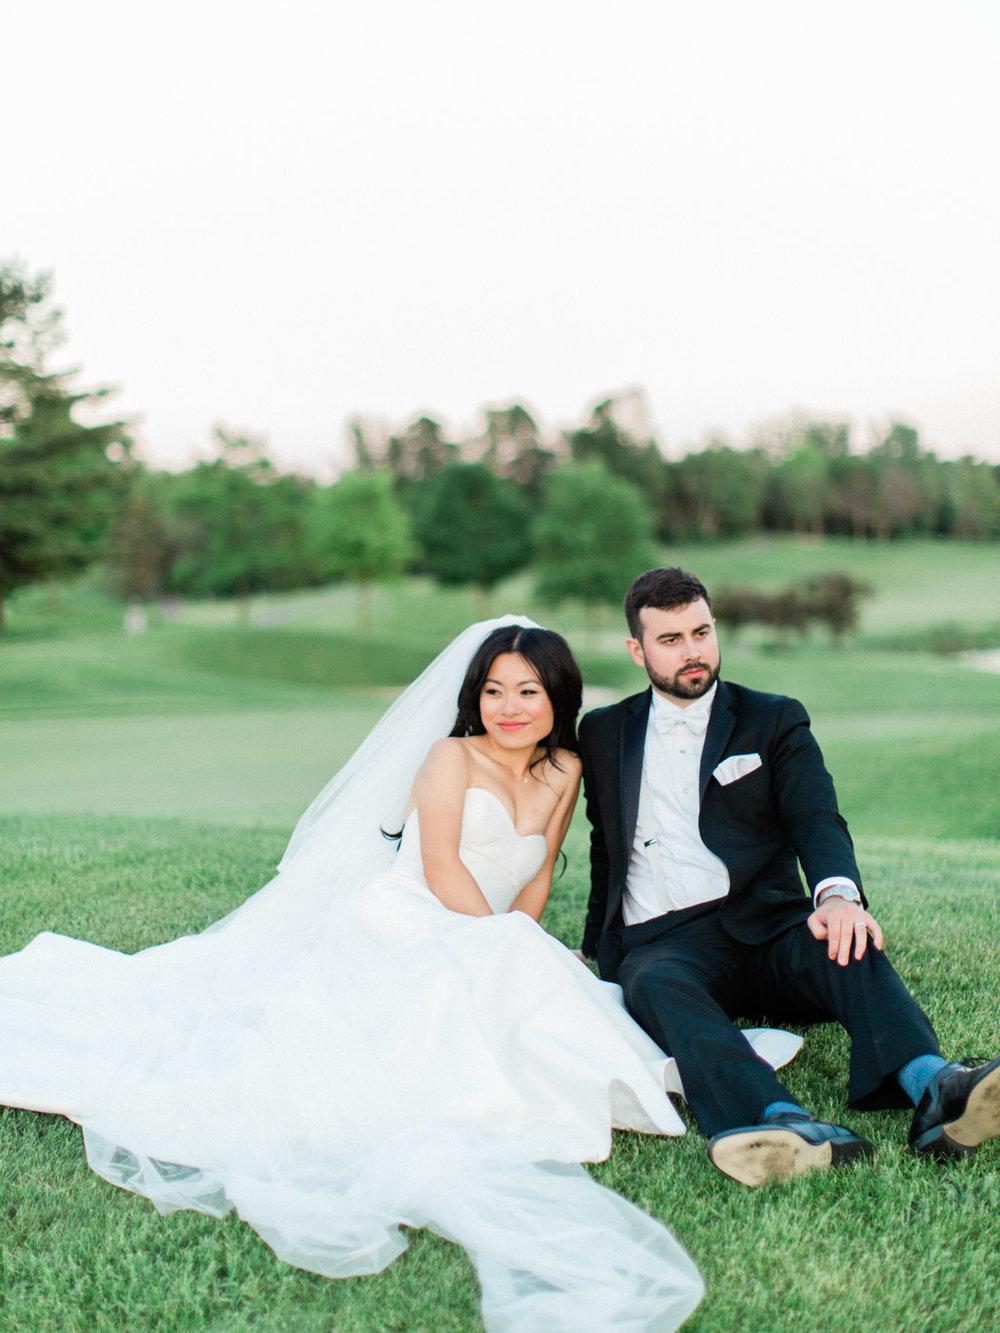 toronto-wedding-photographer-fine-art-documentary-elegant-toronto-golf-club-kings-riding-218.jpg